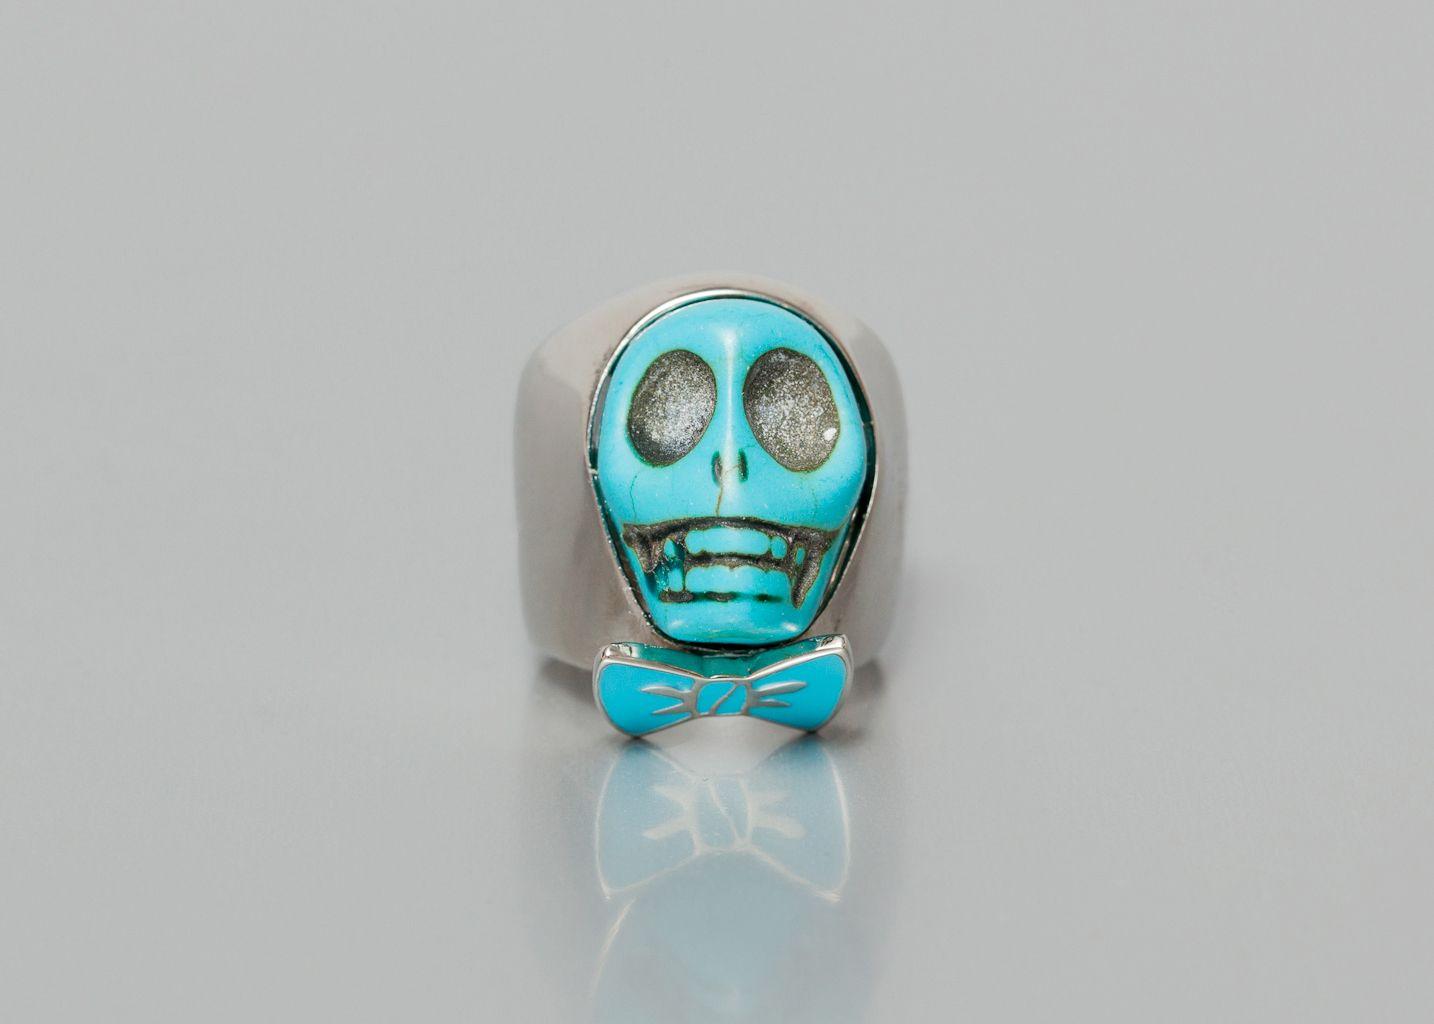 Bague Skull - Alexis Mabille